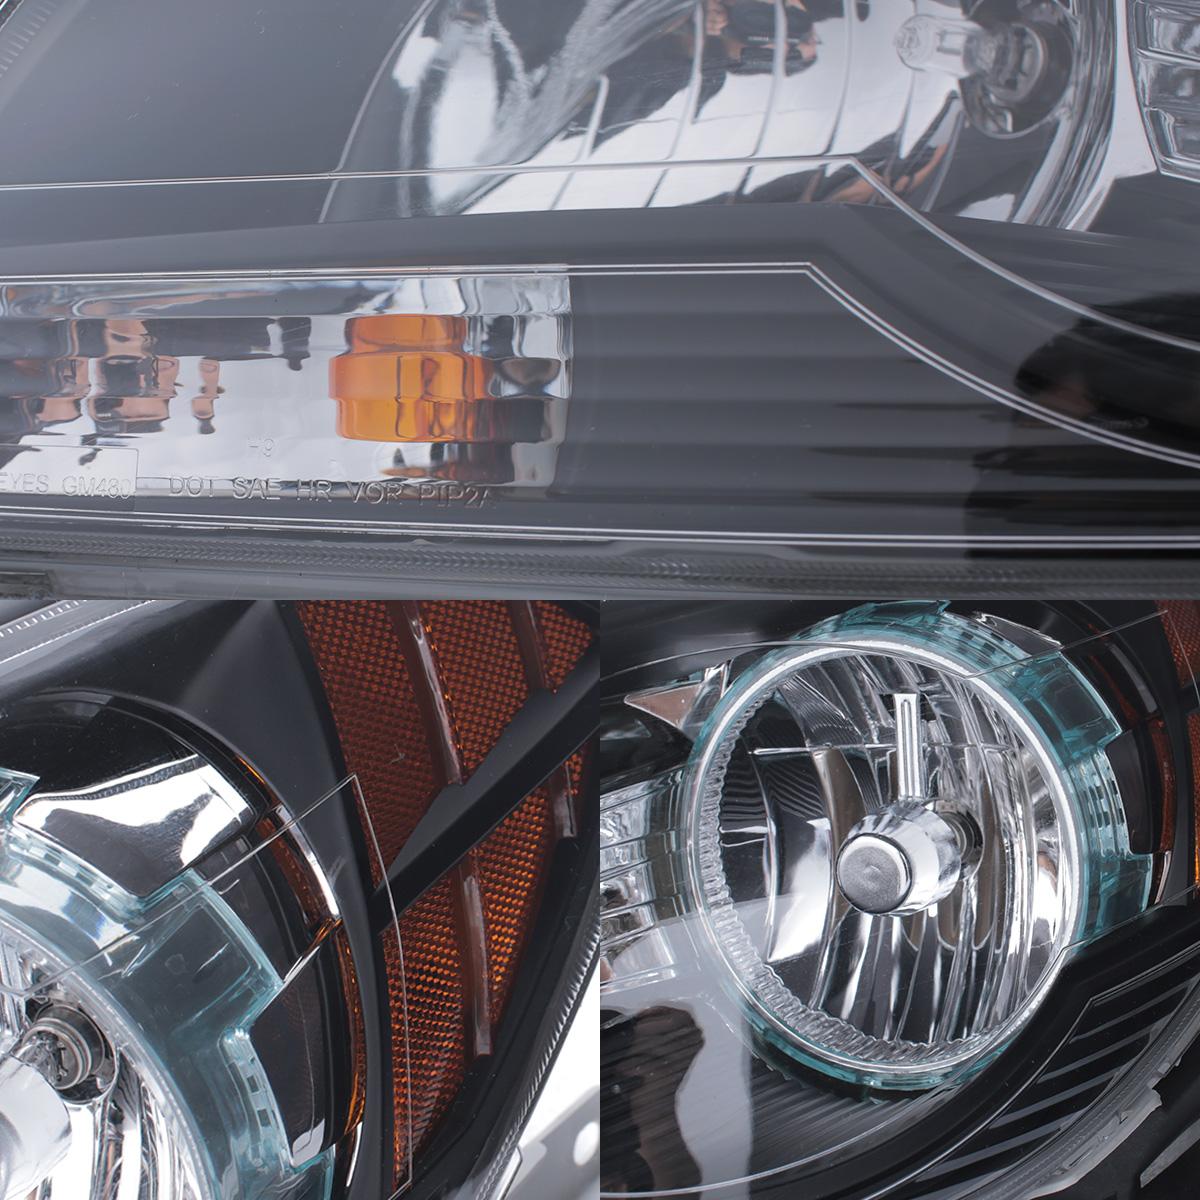 Malibu 2005 chevy malibu headlight bulb : 2008 2009 2010 2011 2012 Chevy Malibu Black Headlights Replacement ...